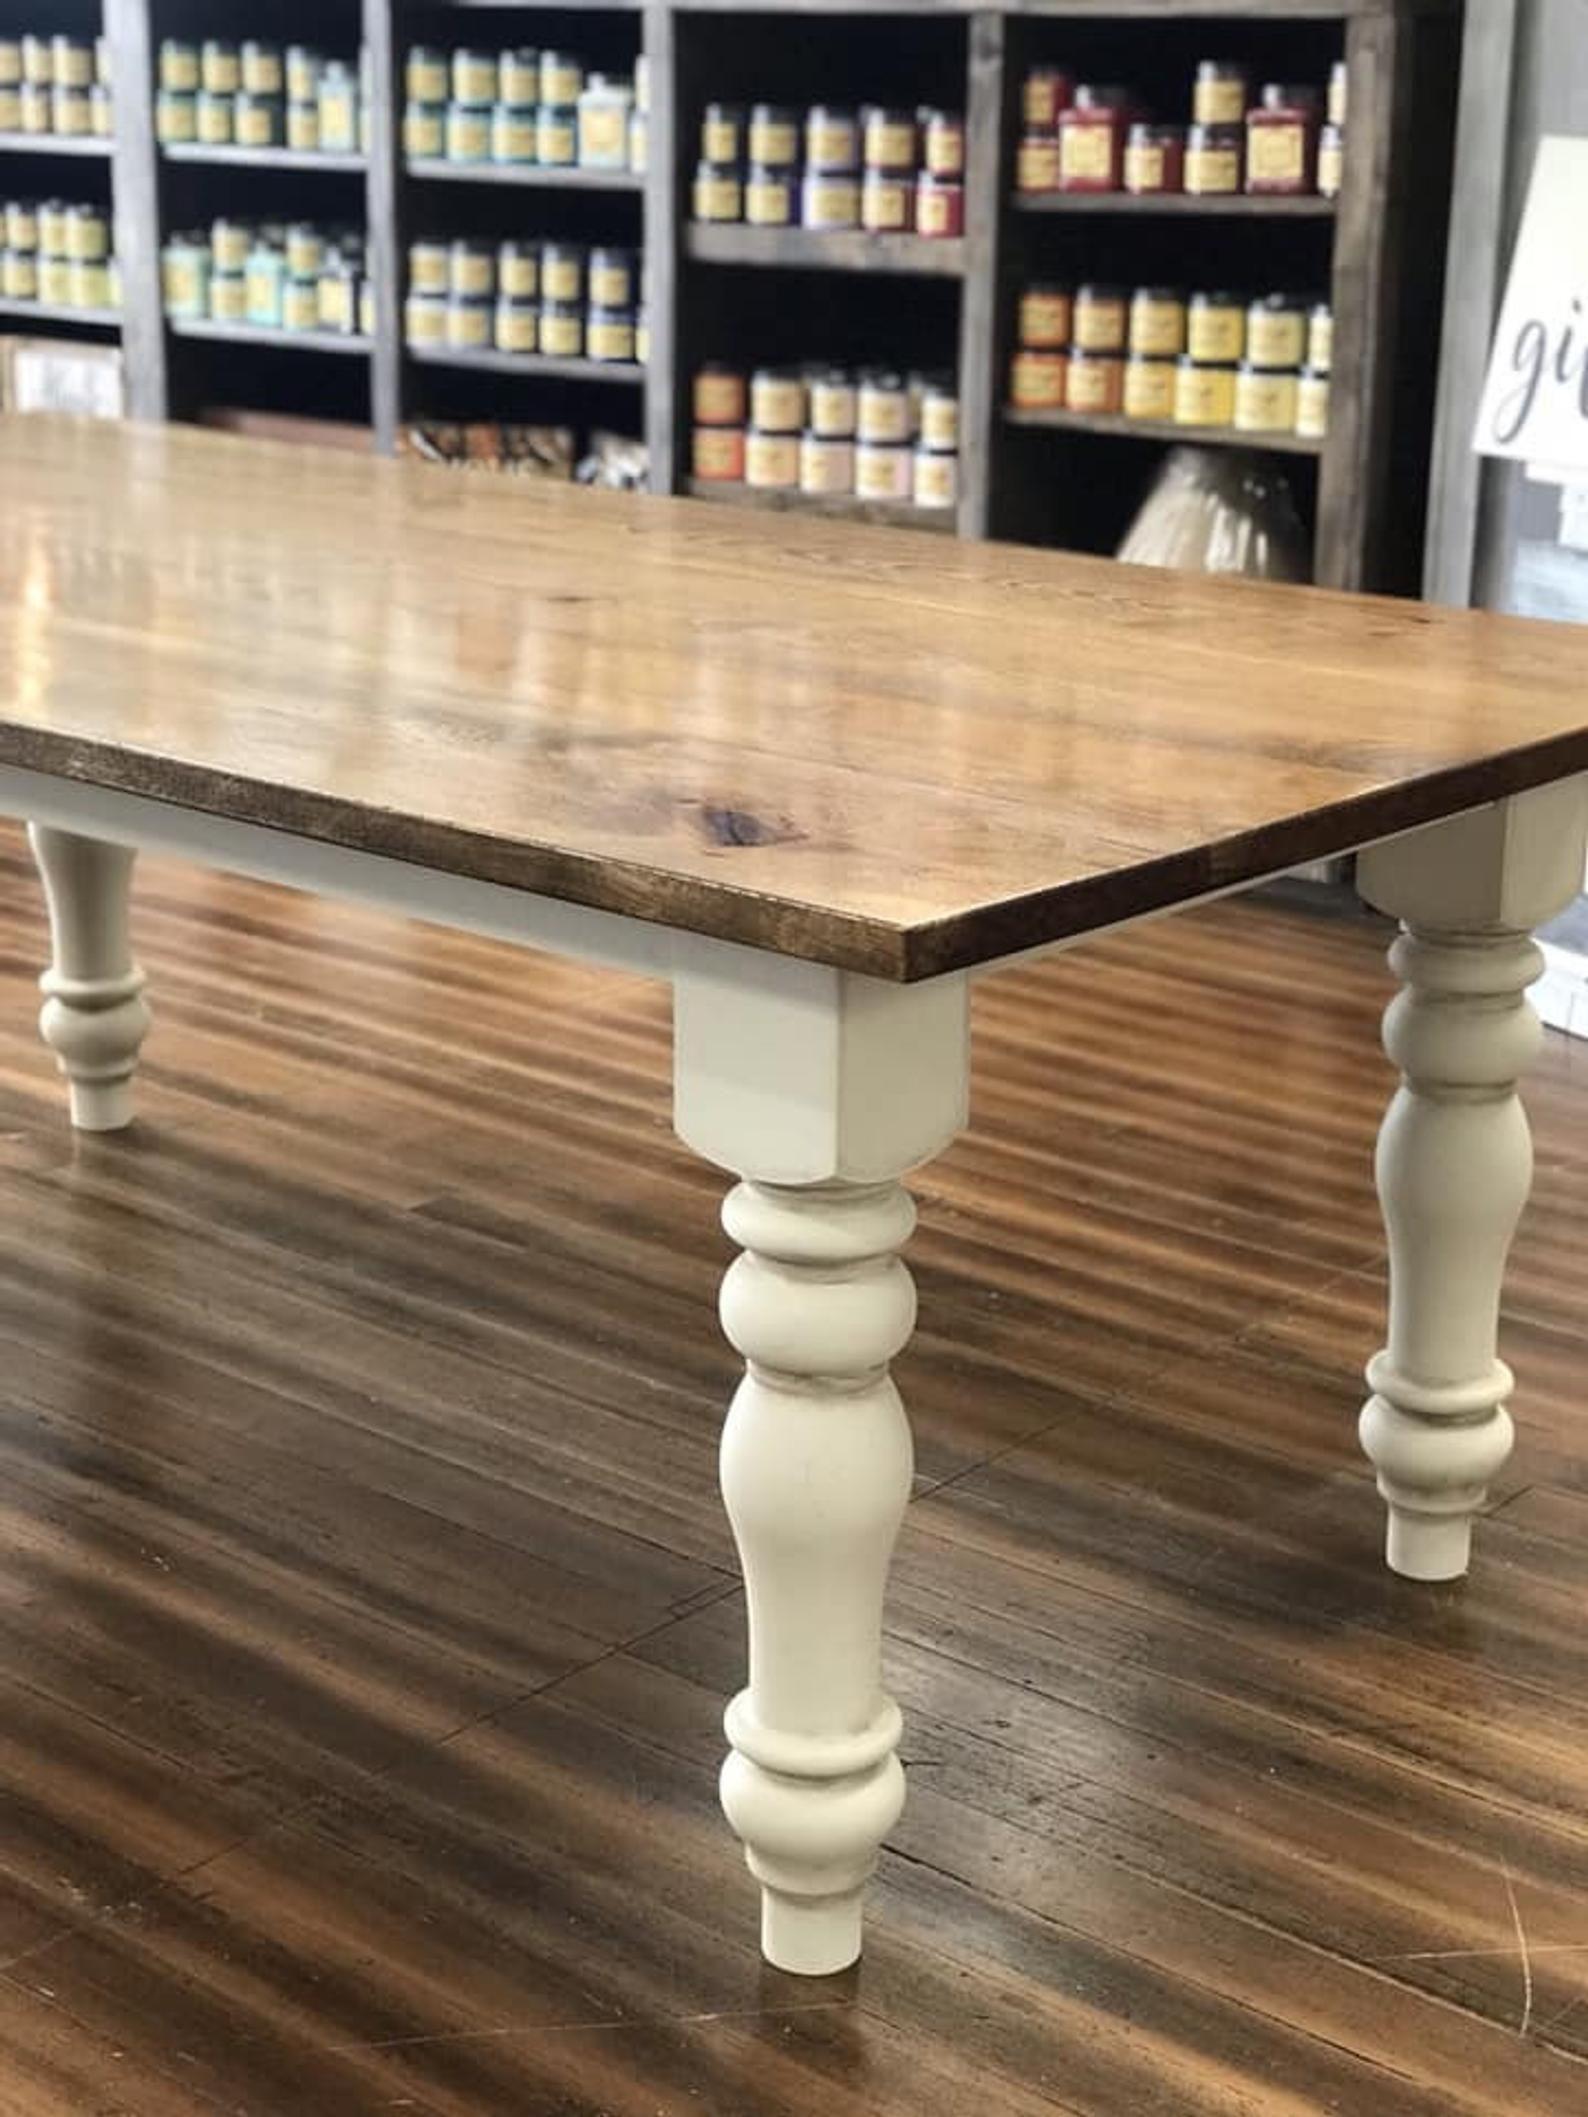 Farmhouse Table Farm Table Wooden Dining Room Table Rustic